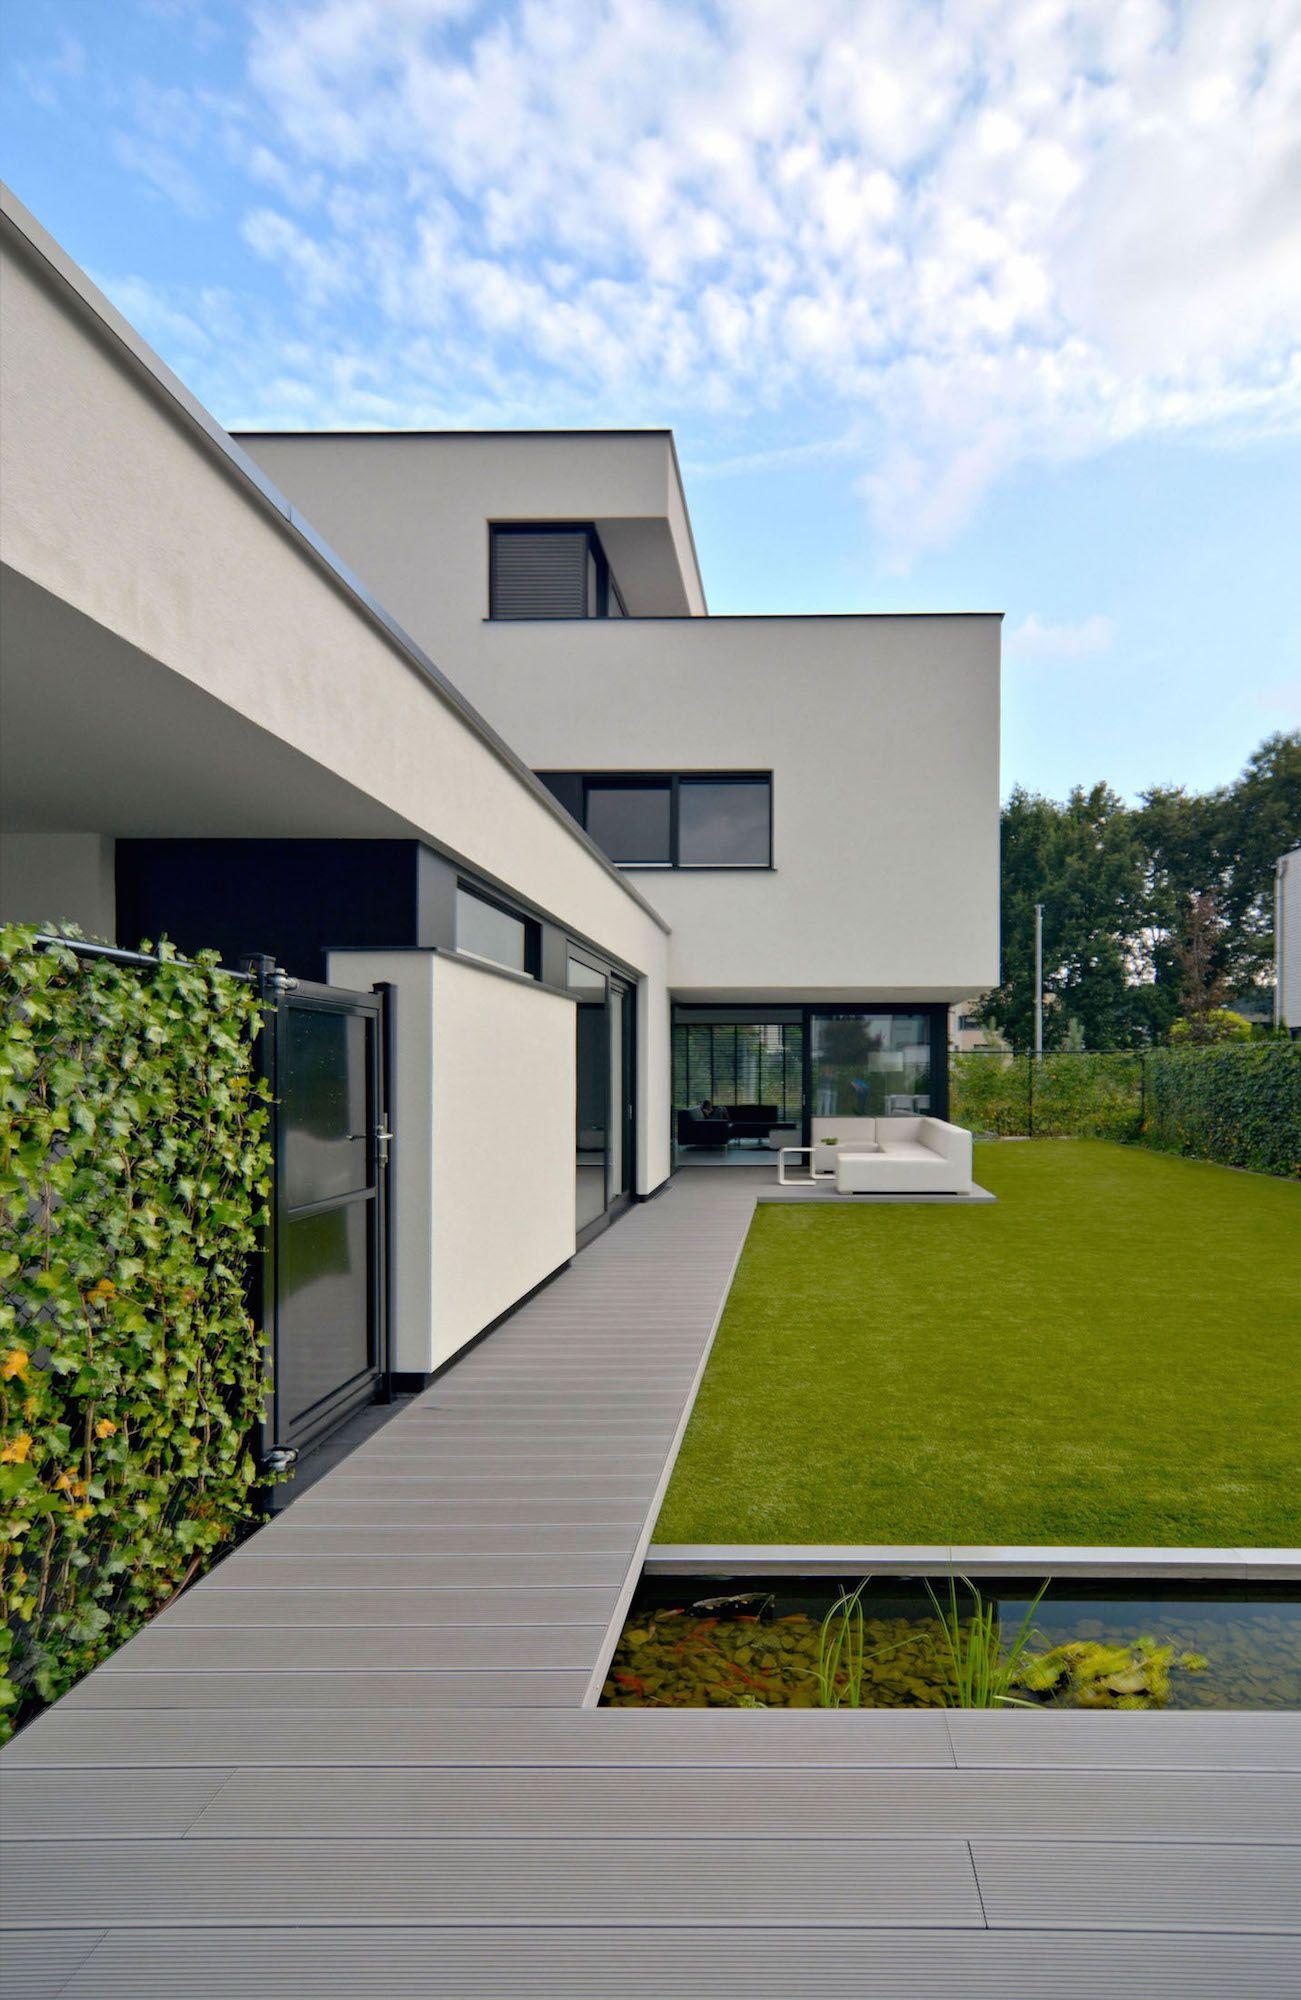 House-K-N-02